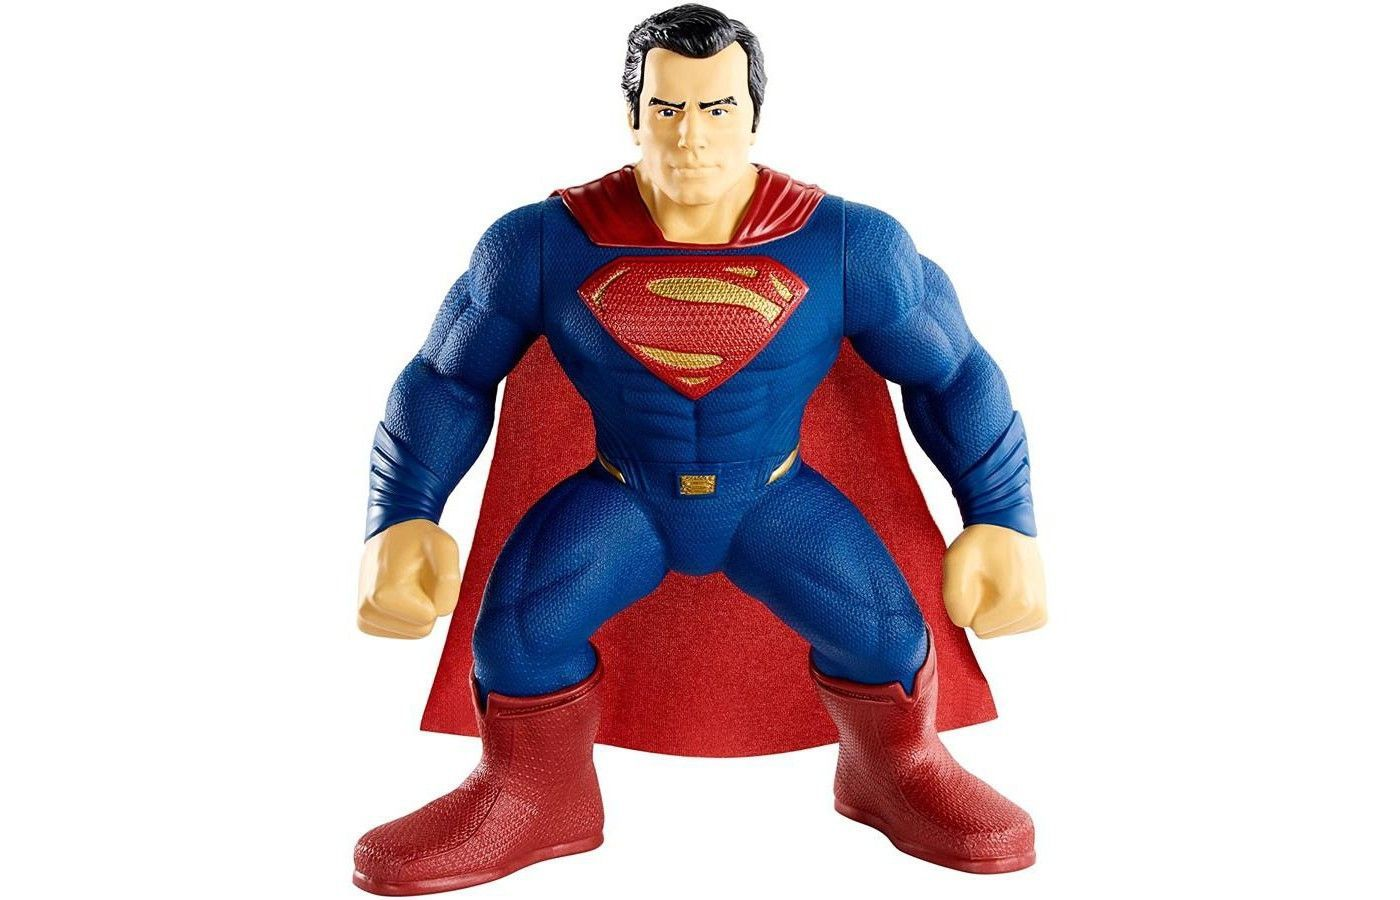 DC Justice League Team Trainers Batman Figure